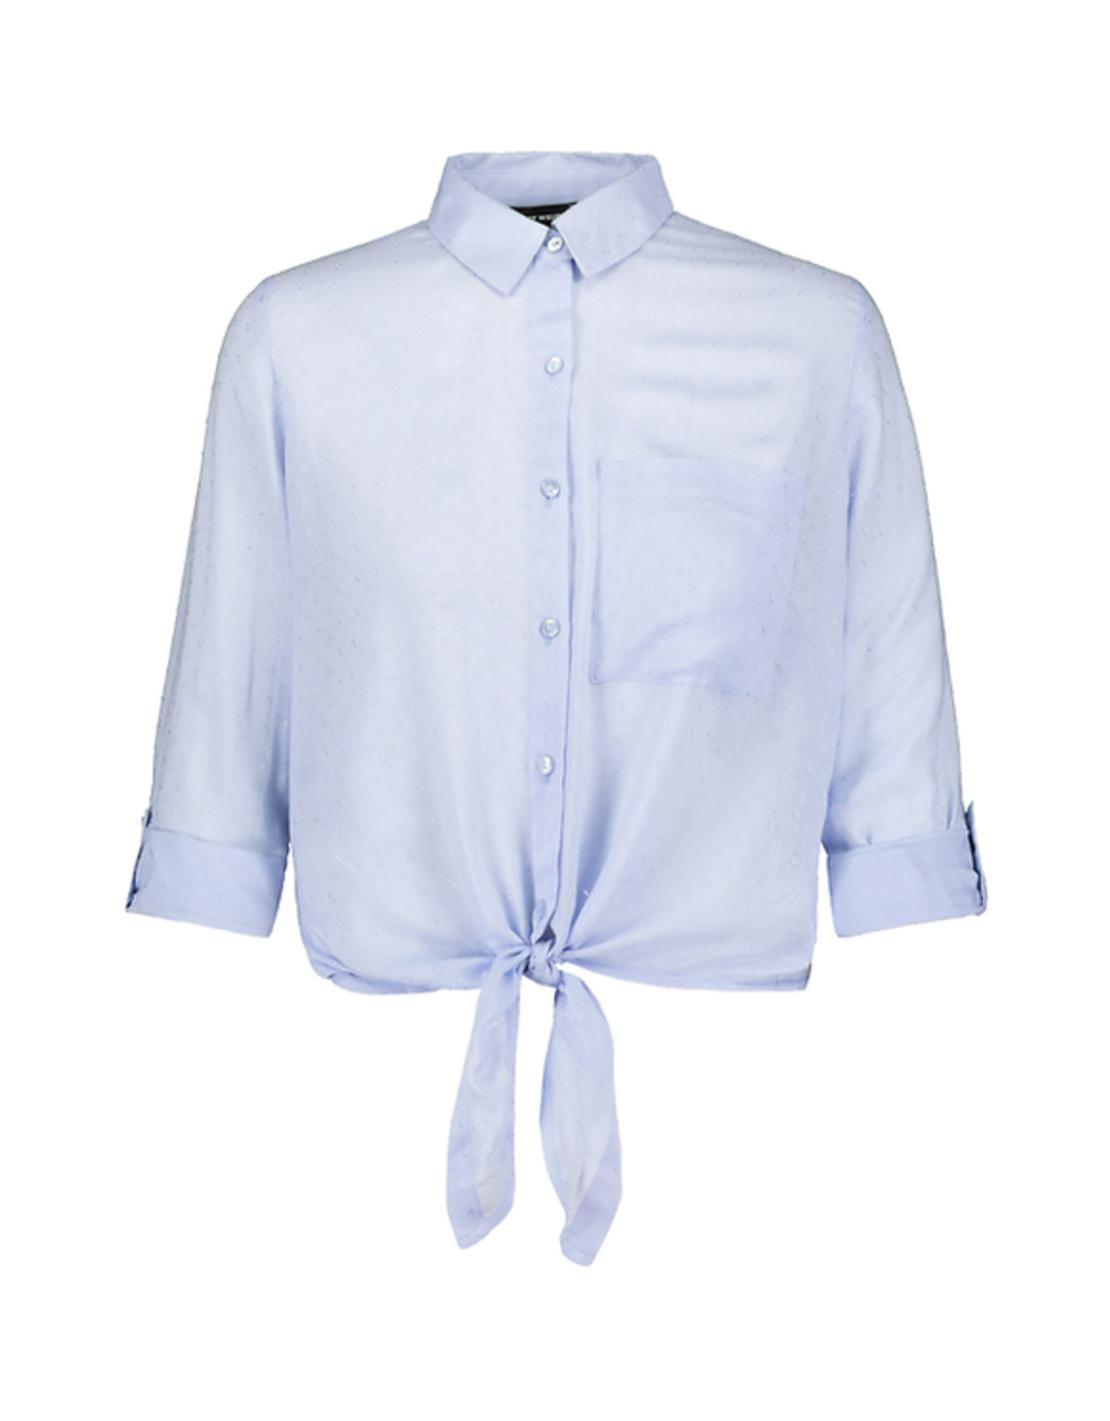 SWSMOFORUXY-EM חולצה מכופתרת קשירה תכלת